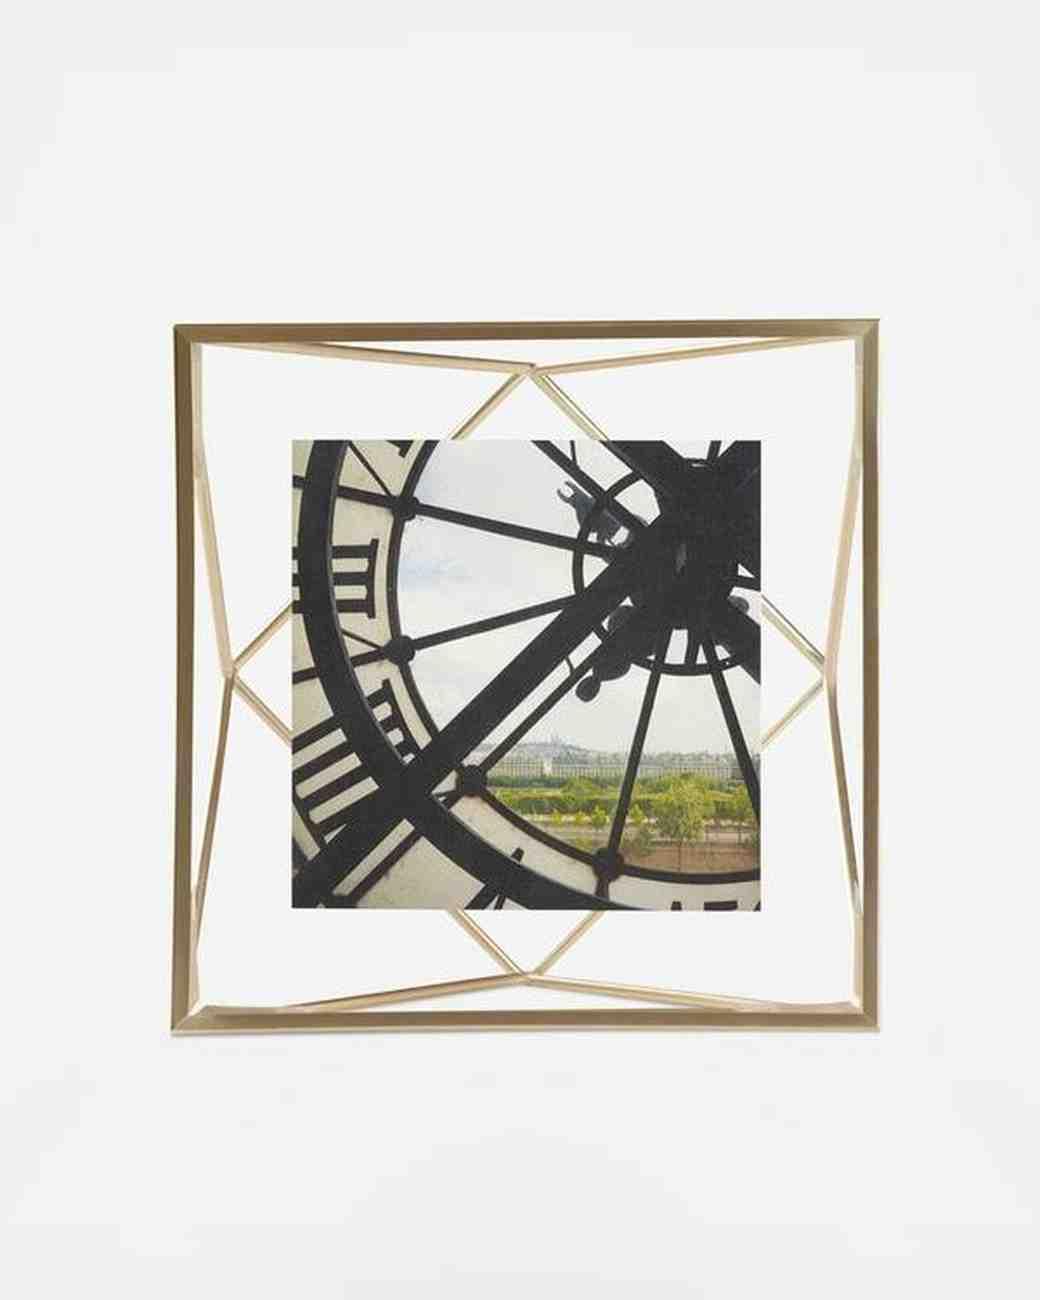 Umbra Picture Frame